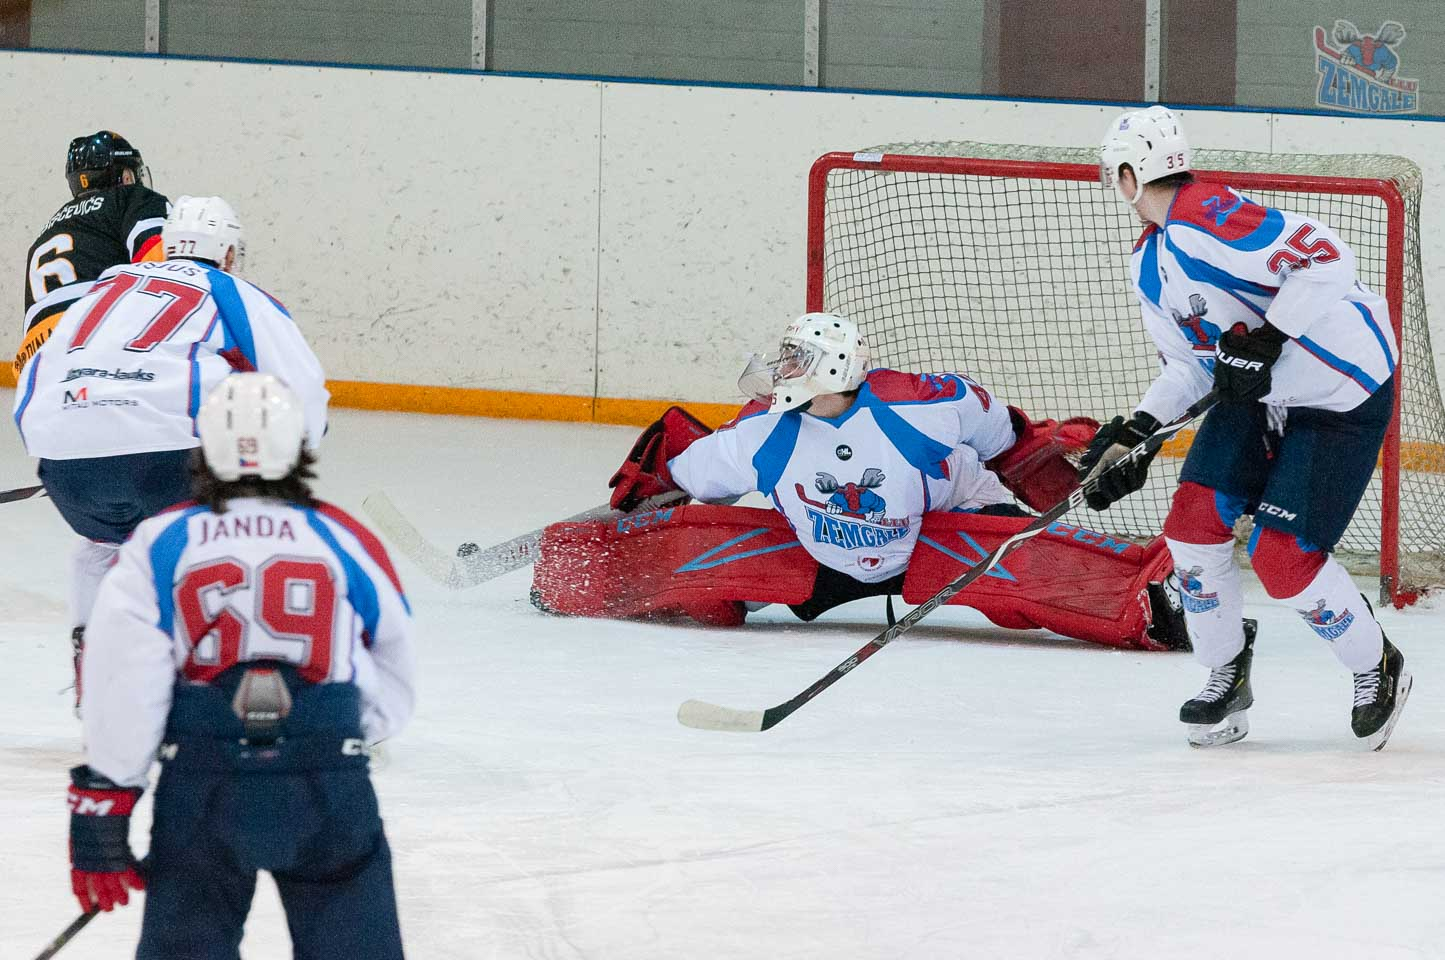 Hokeja vārtsargs nosēžas špagatā, lai atvairītu ripu